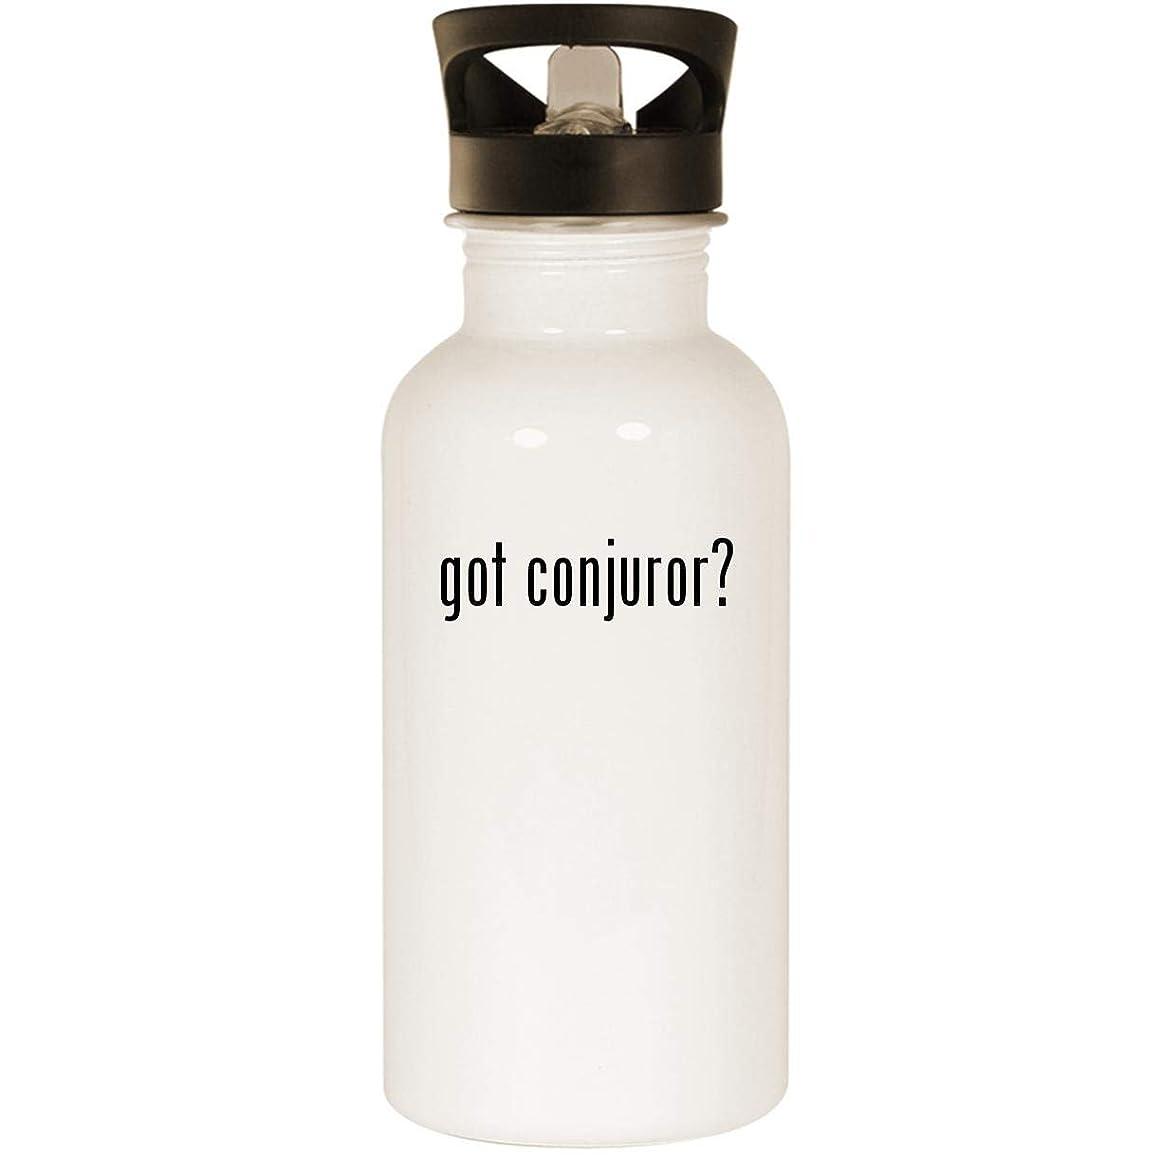 got conjuror? - Stainless Steel 20oz Road Ready Water Bottle, White